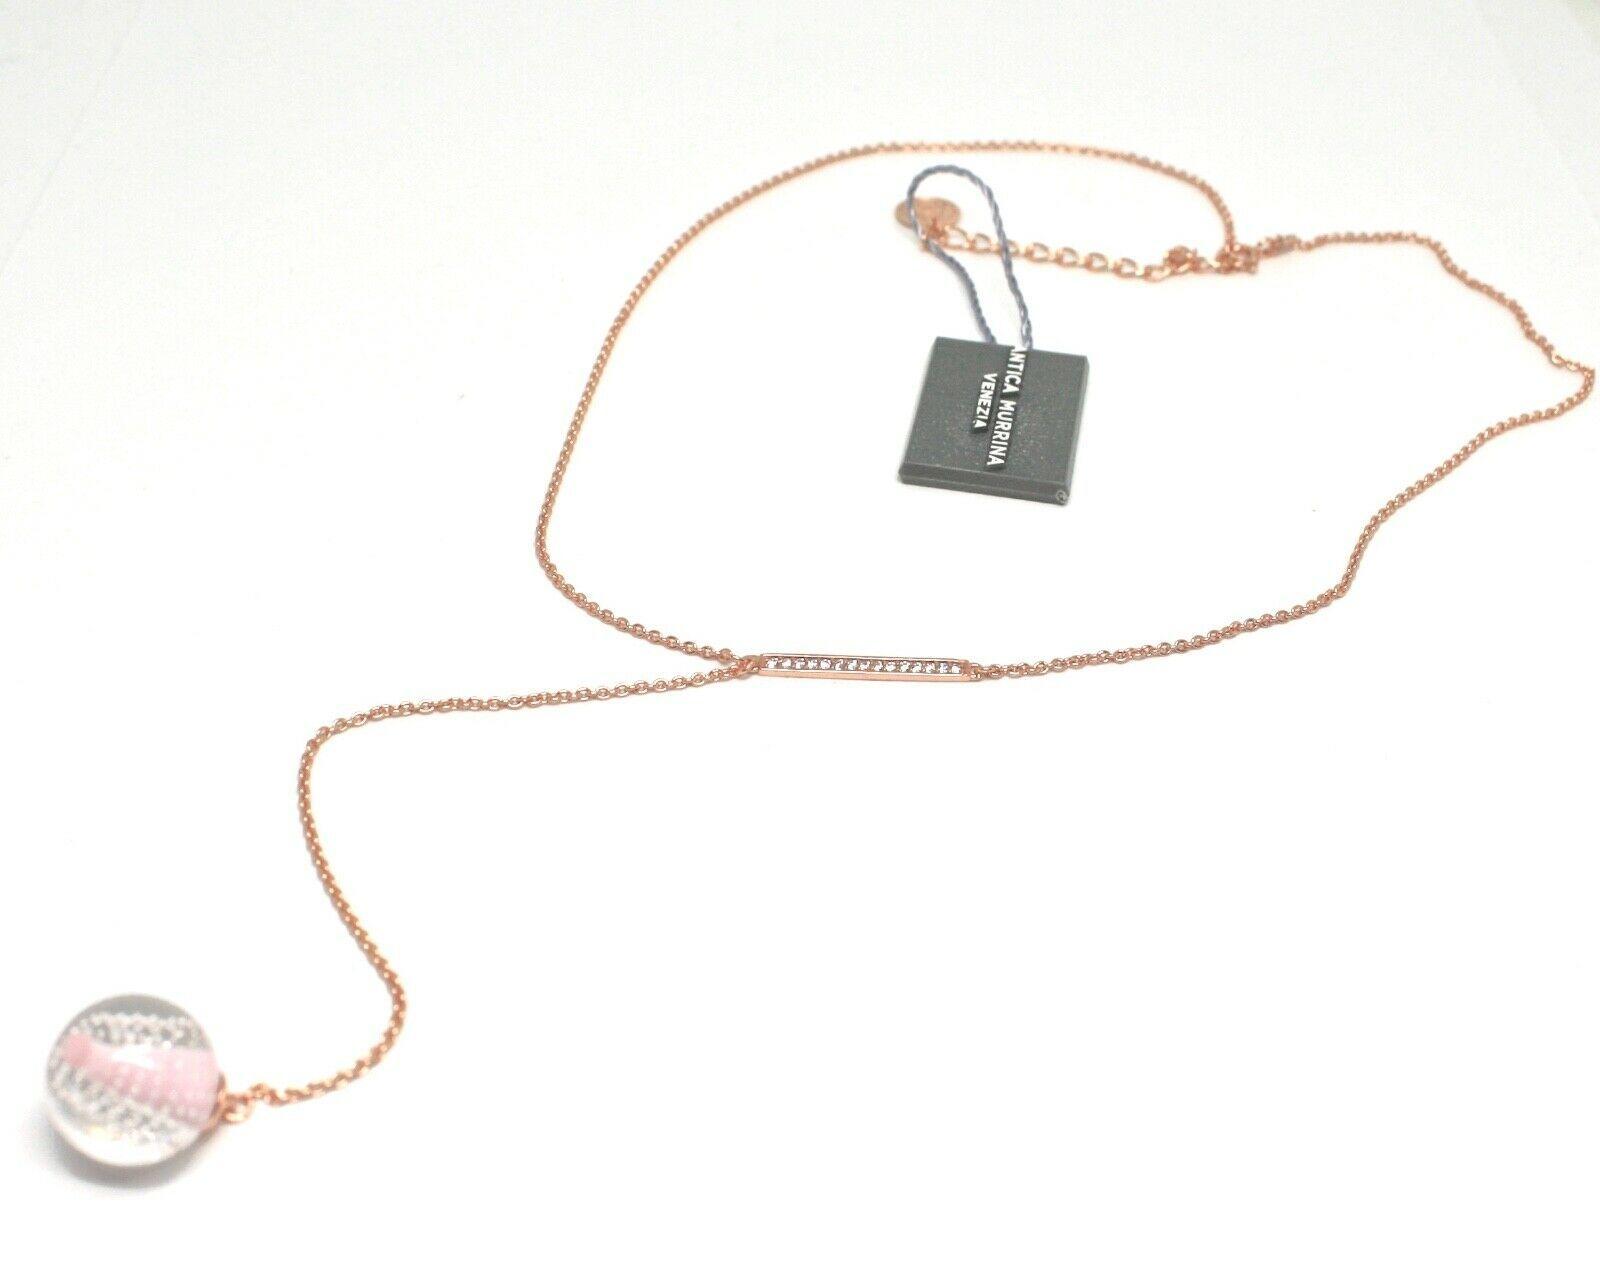 Collar Antica Murrina Venezia de Plata 925 con Cristal de Murano AMVJWCP009C03 image 3